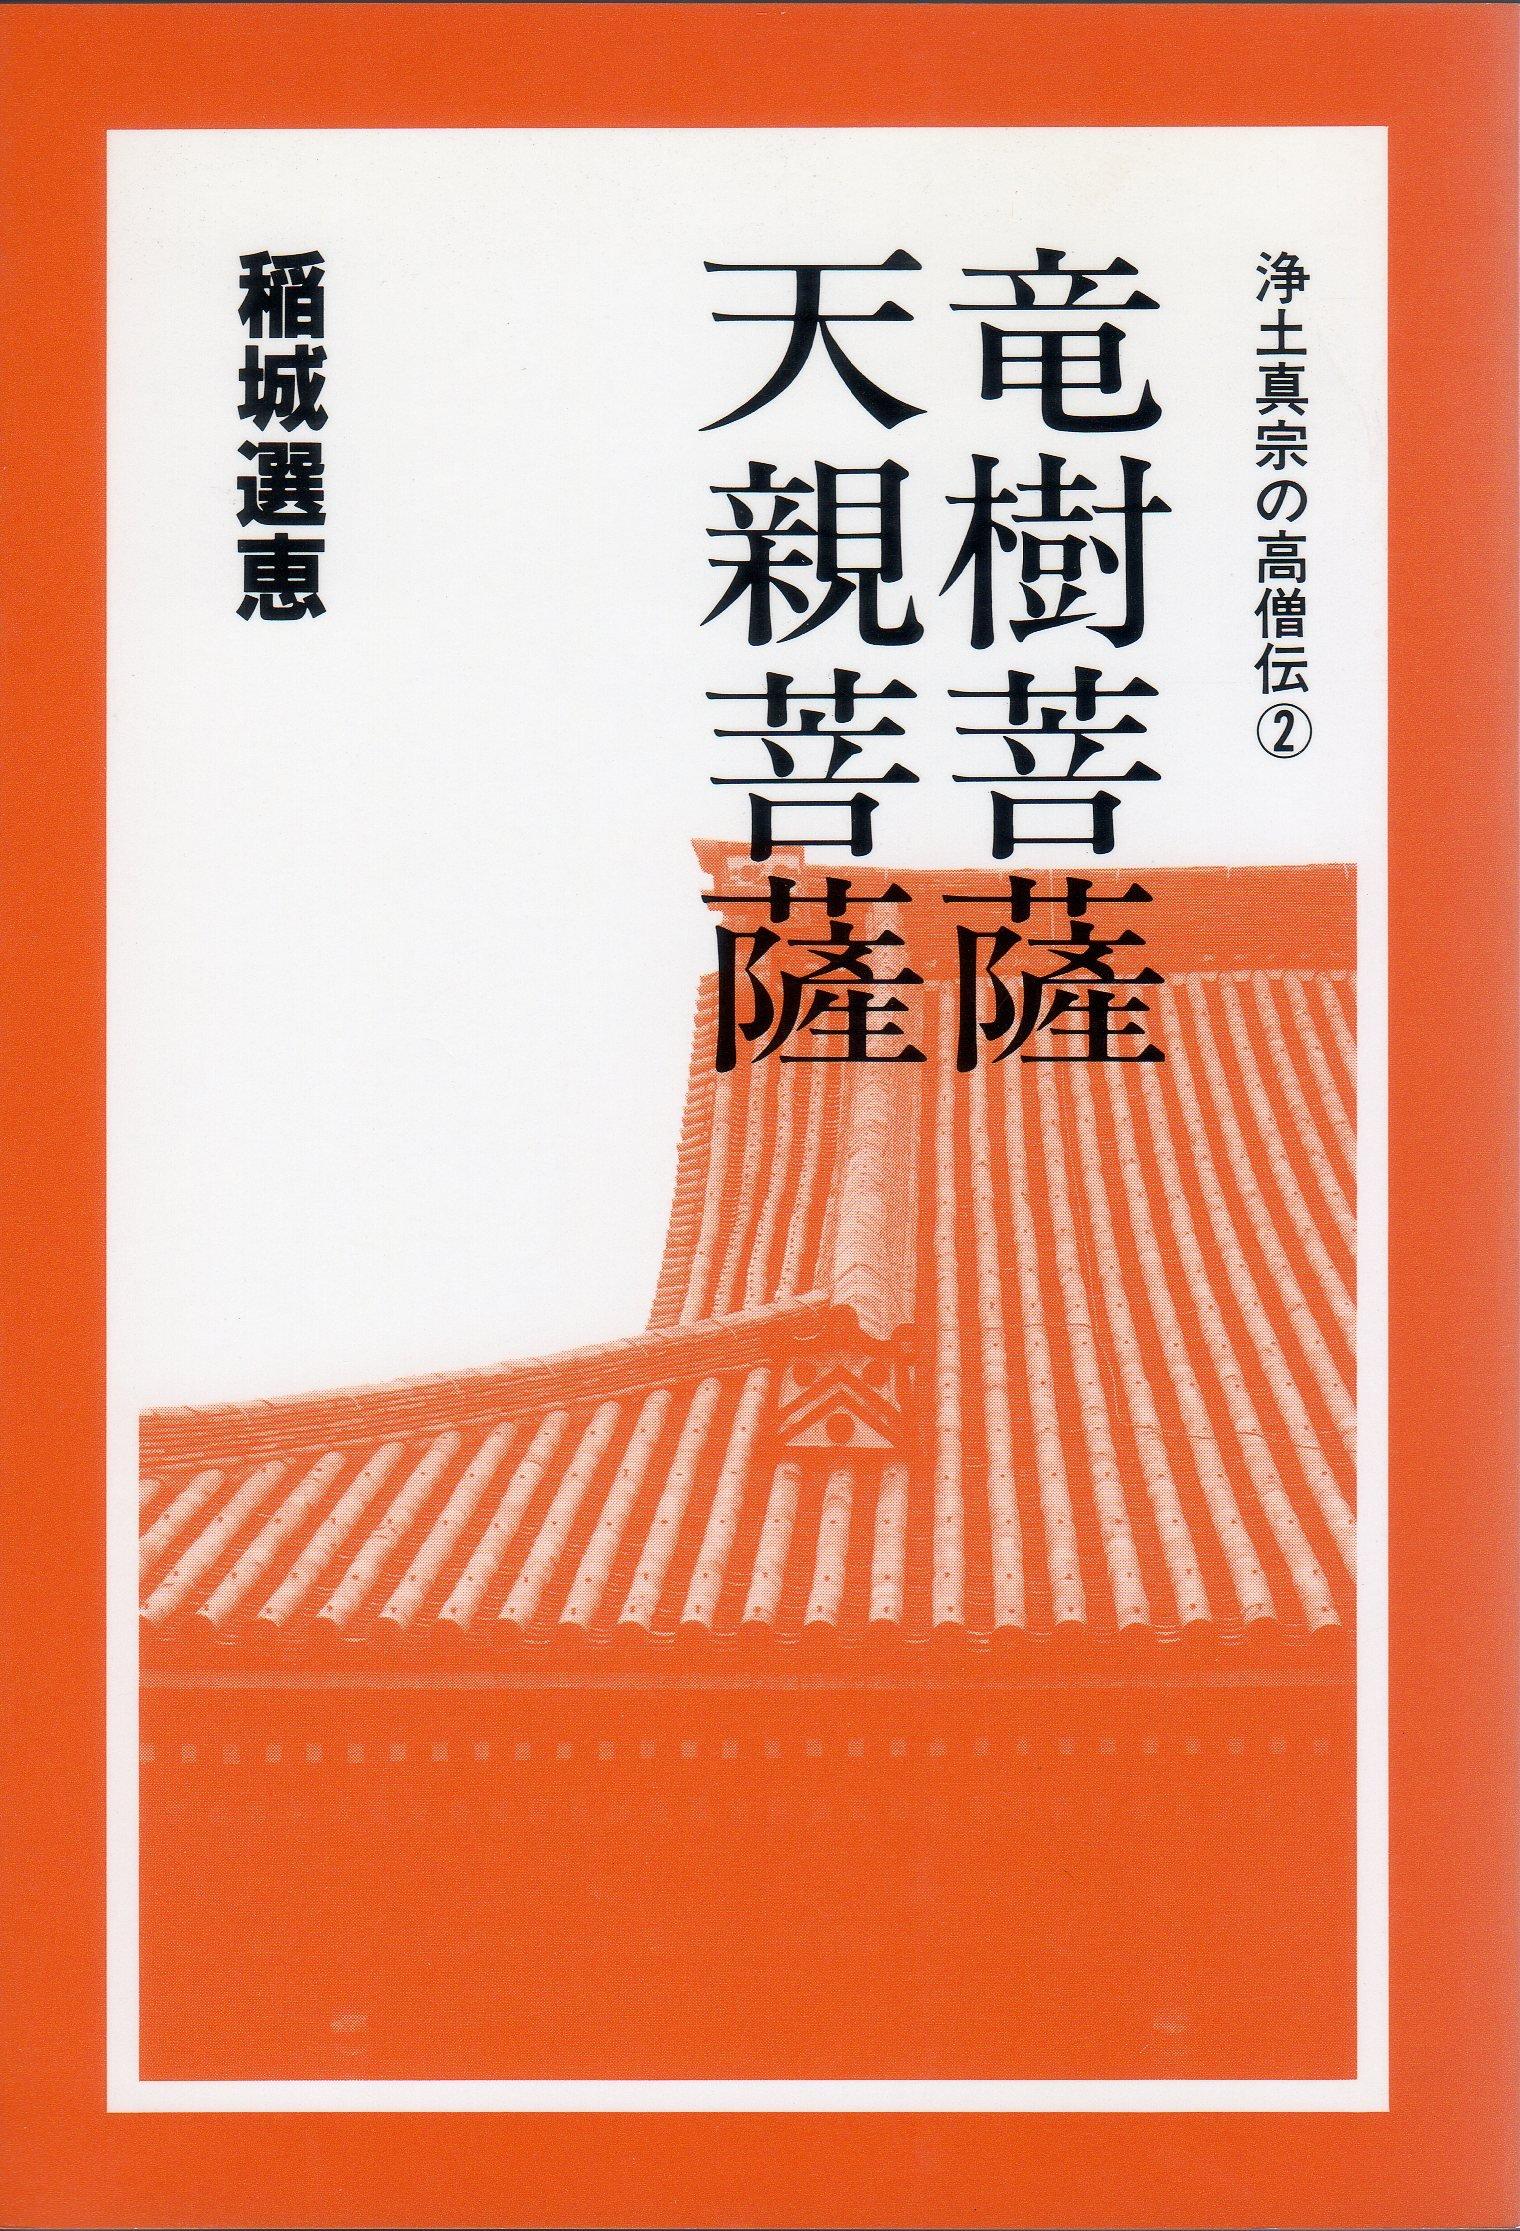 Amazon.co.jp: 浄土真宗の高僧伝②竜樹菩薩 天親菩薩: 稲城 選恵: 本